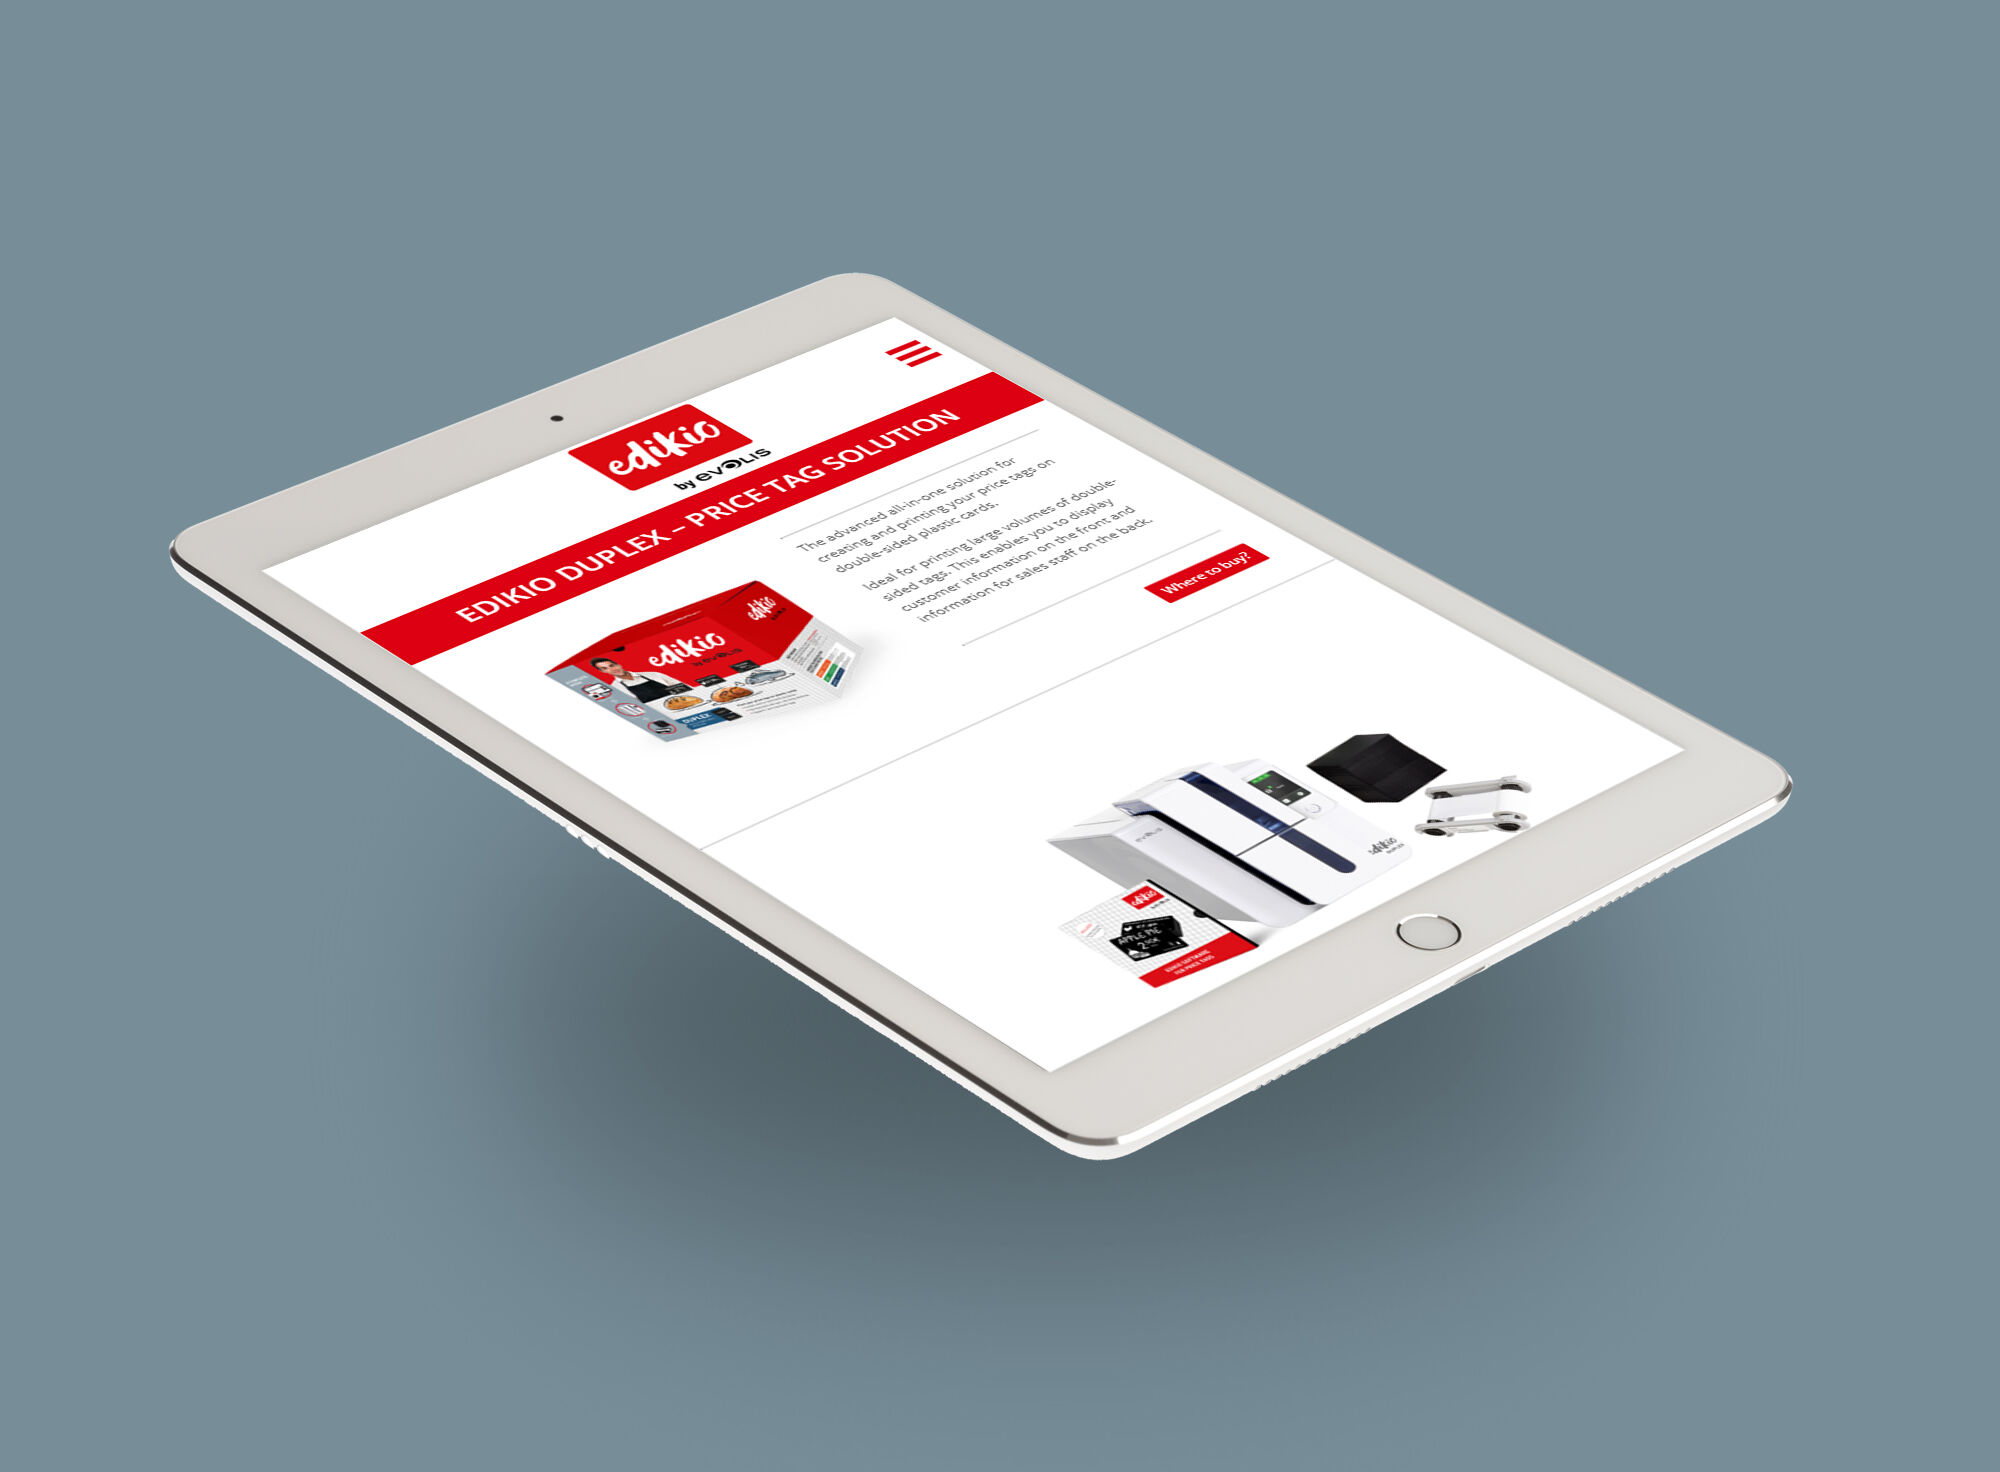 Edikio iPad view